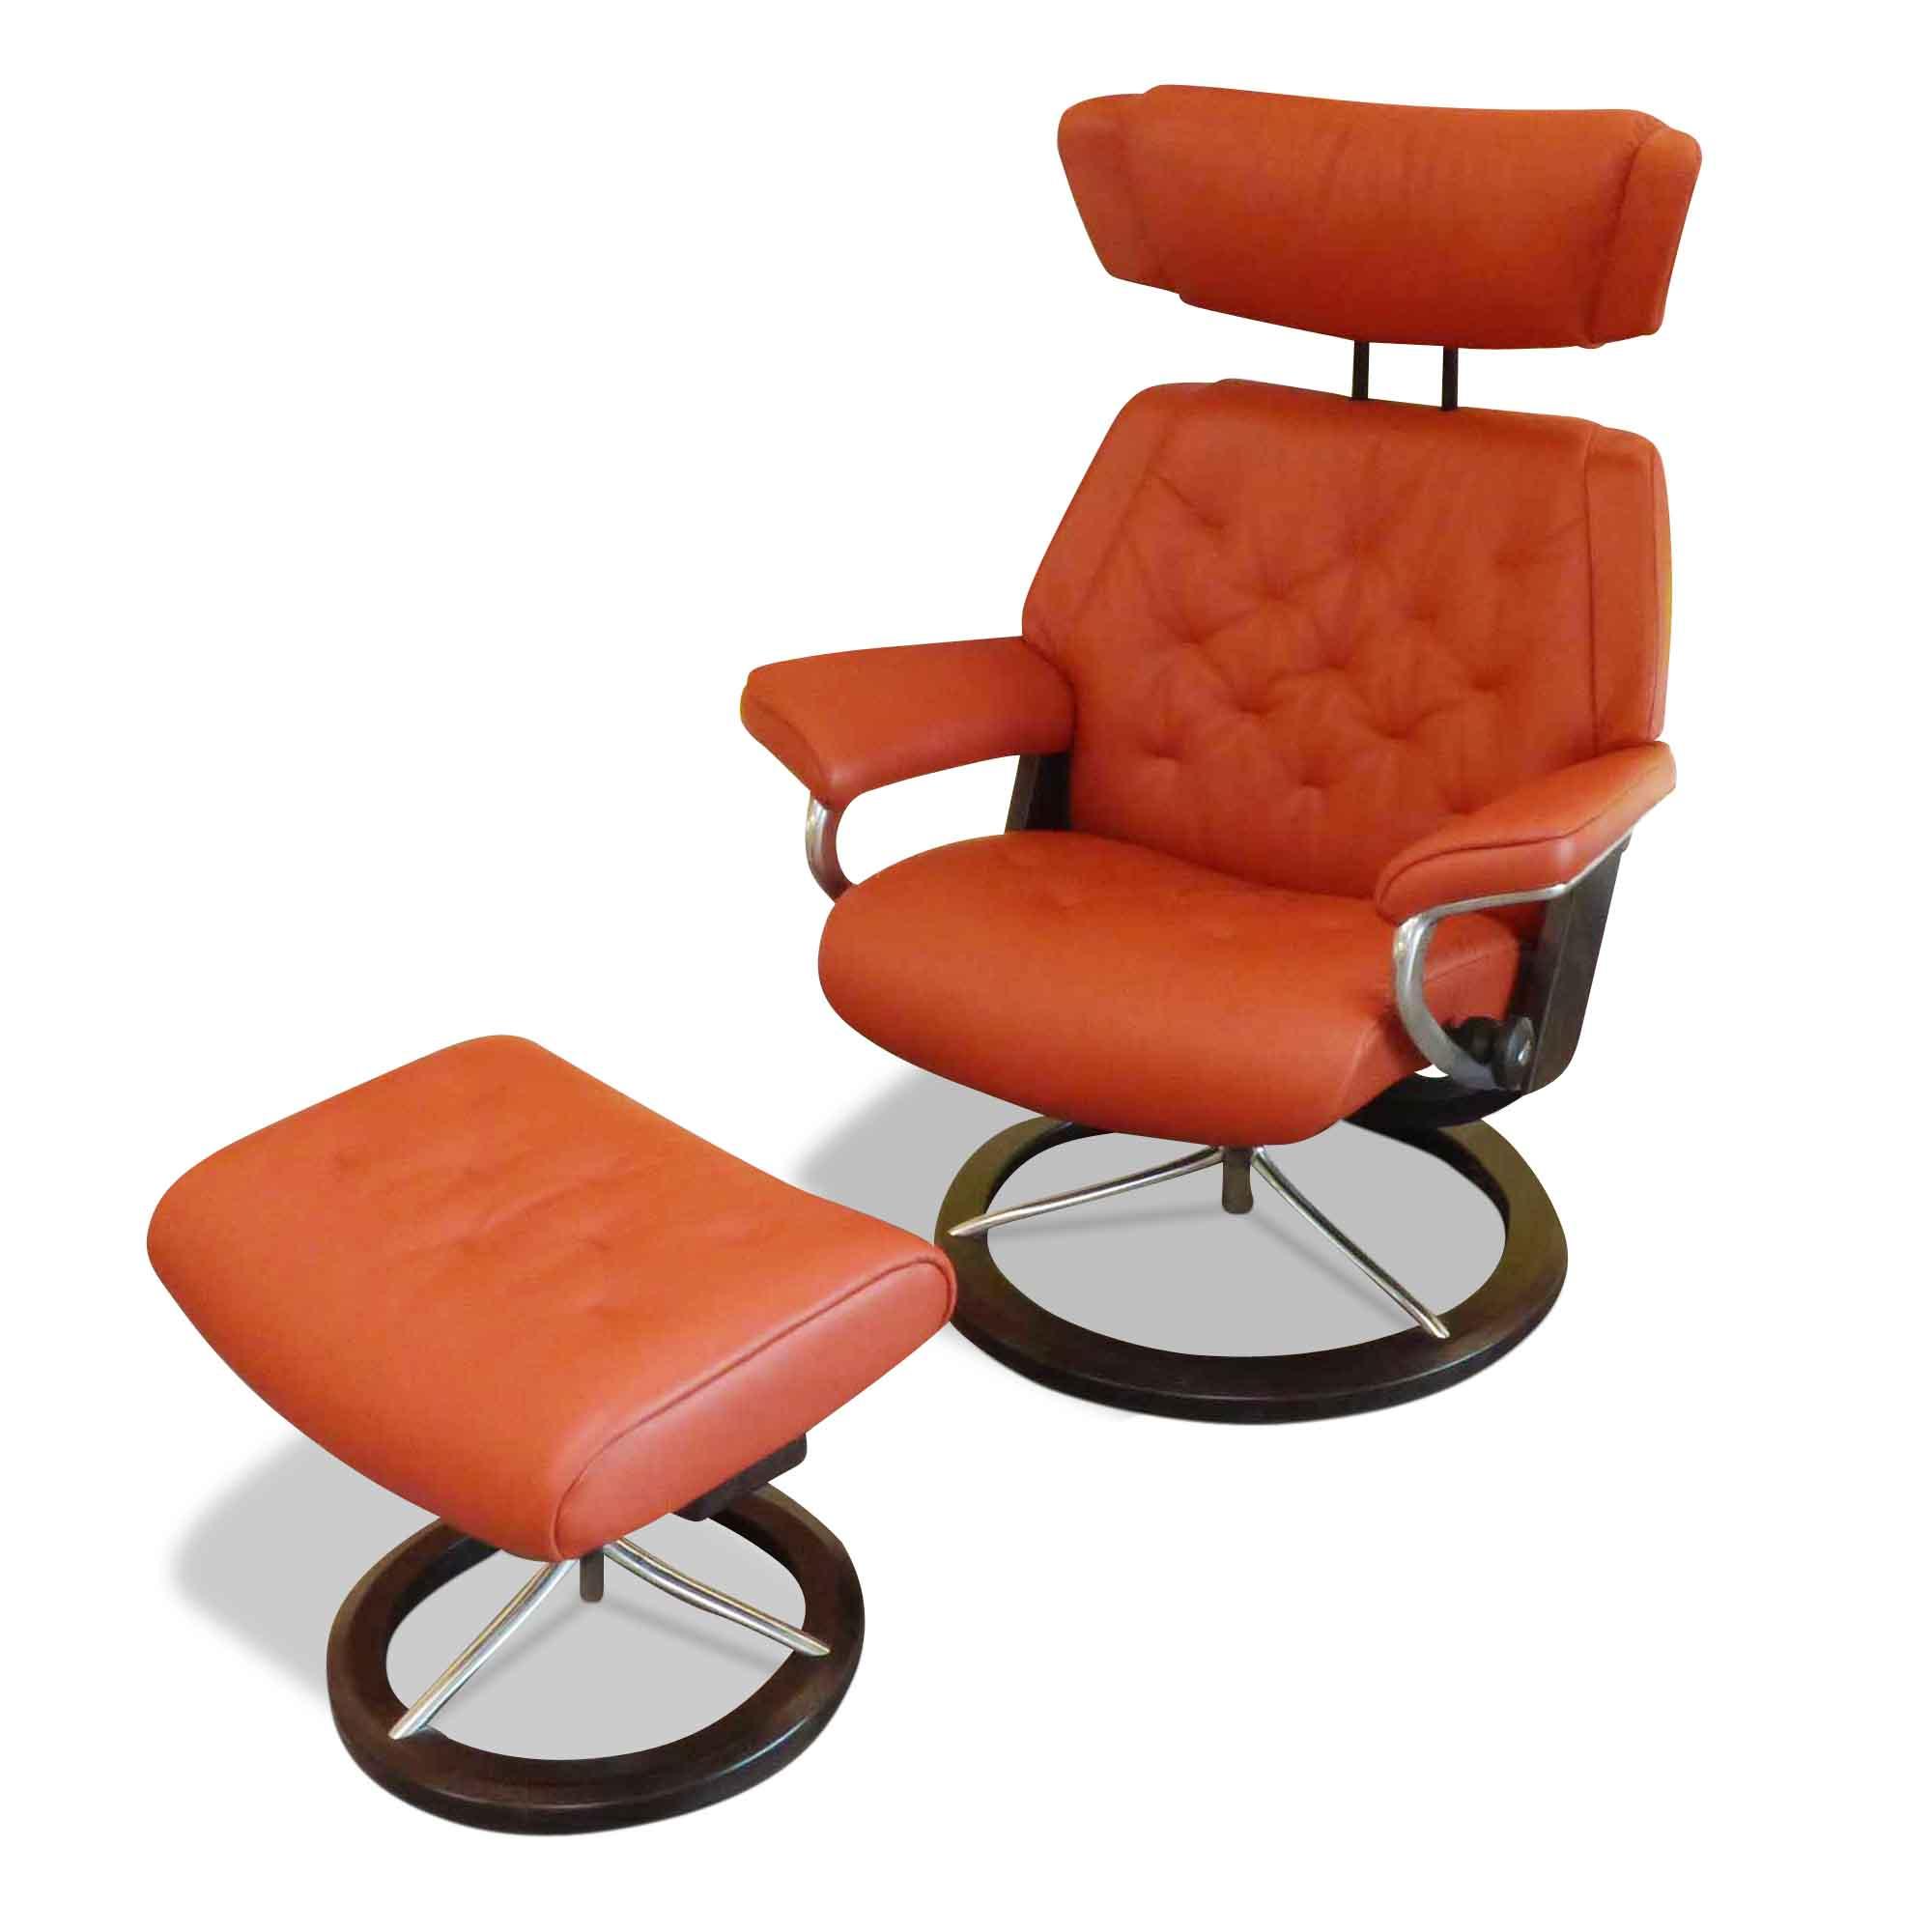 sessel skyline m mit hocker rot stressless sessel g nstig kaufen m belfirst. Black Bedroom Furniture Sets. Home Design Ideas